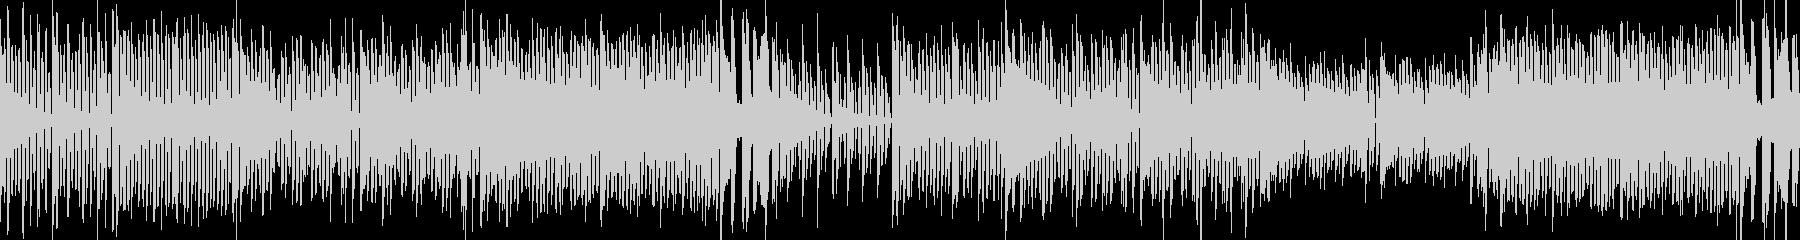 8bitゲームの街 ピコピコ ループの未再生の波形